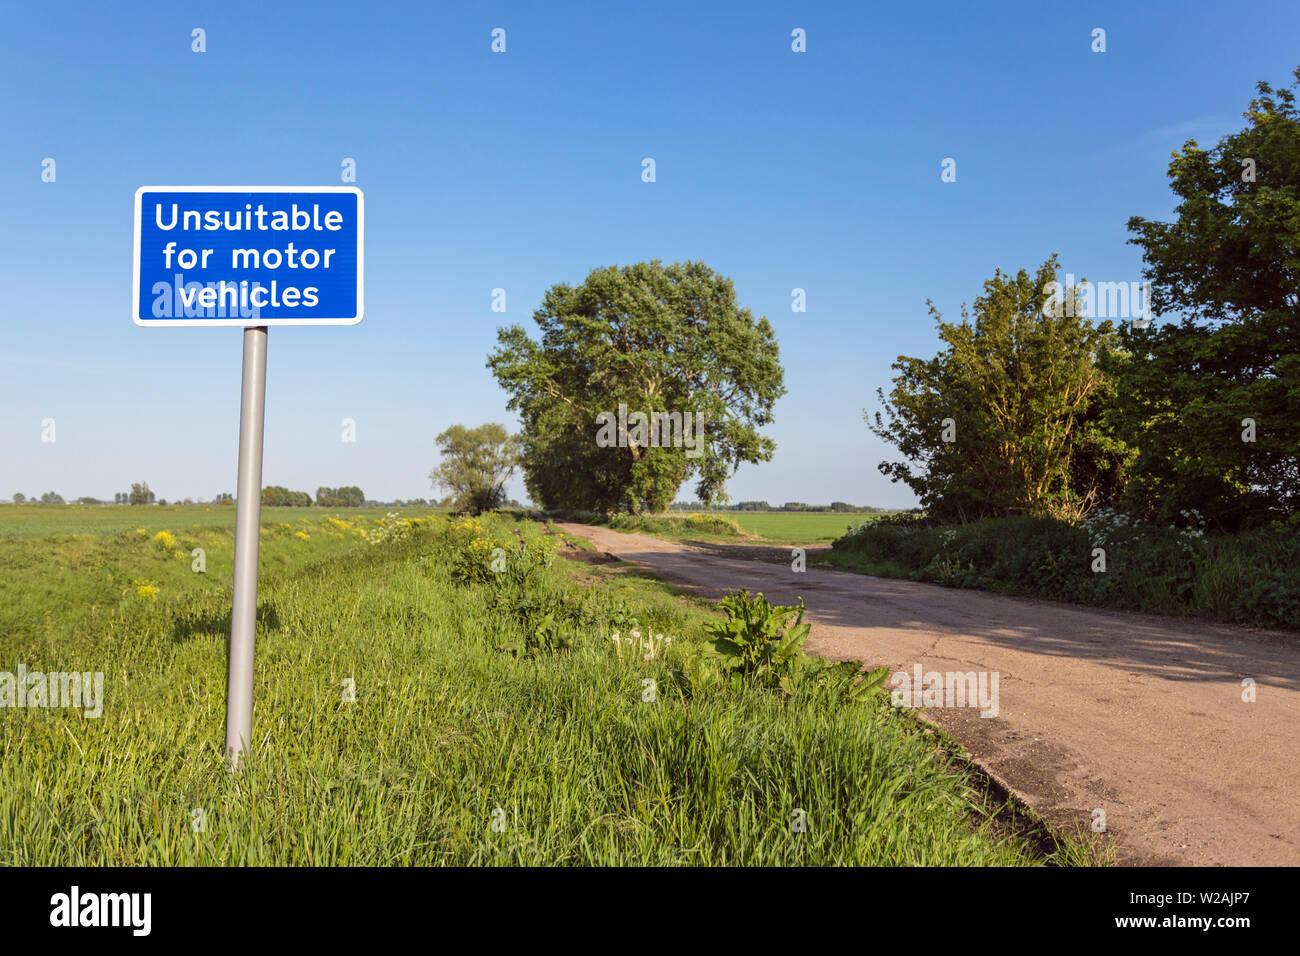 'Unsuitable for motor vehicles' sign, near Aldreth, Cambridgeshire, England, UK - Stock Image